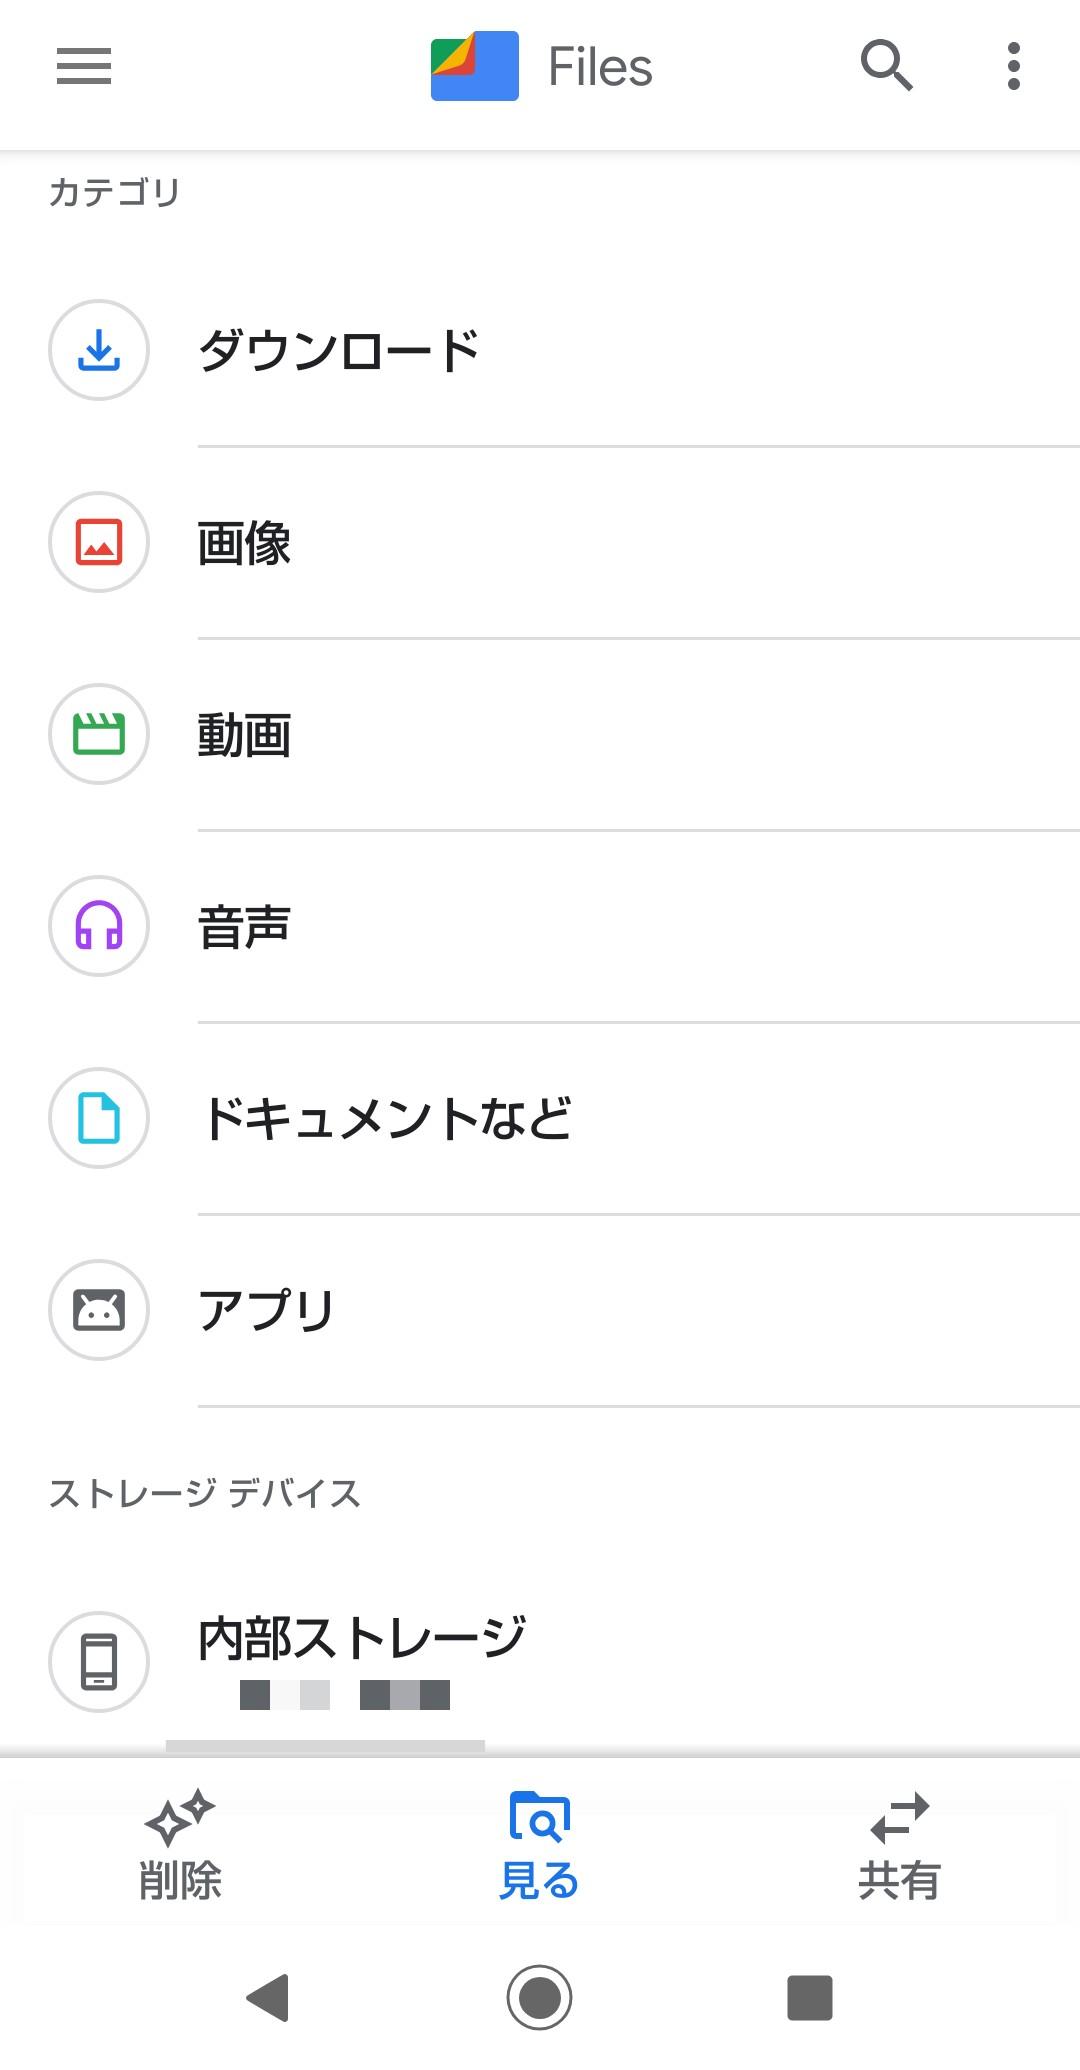 Files by Googleの画面